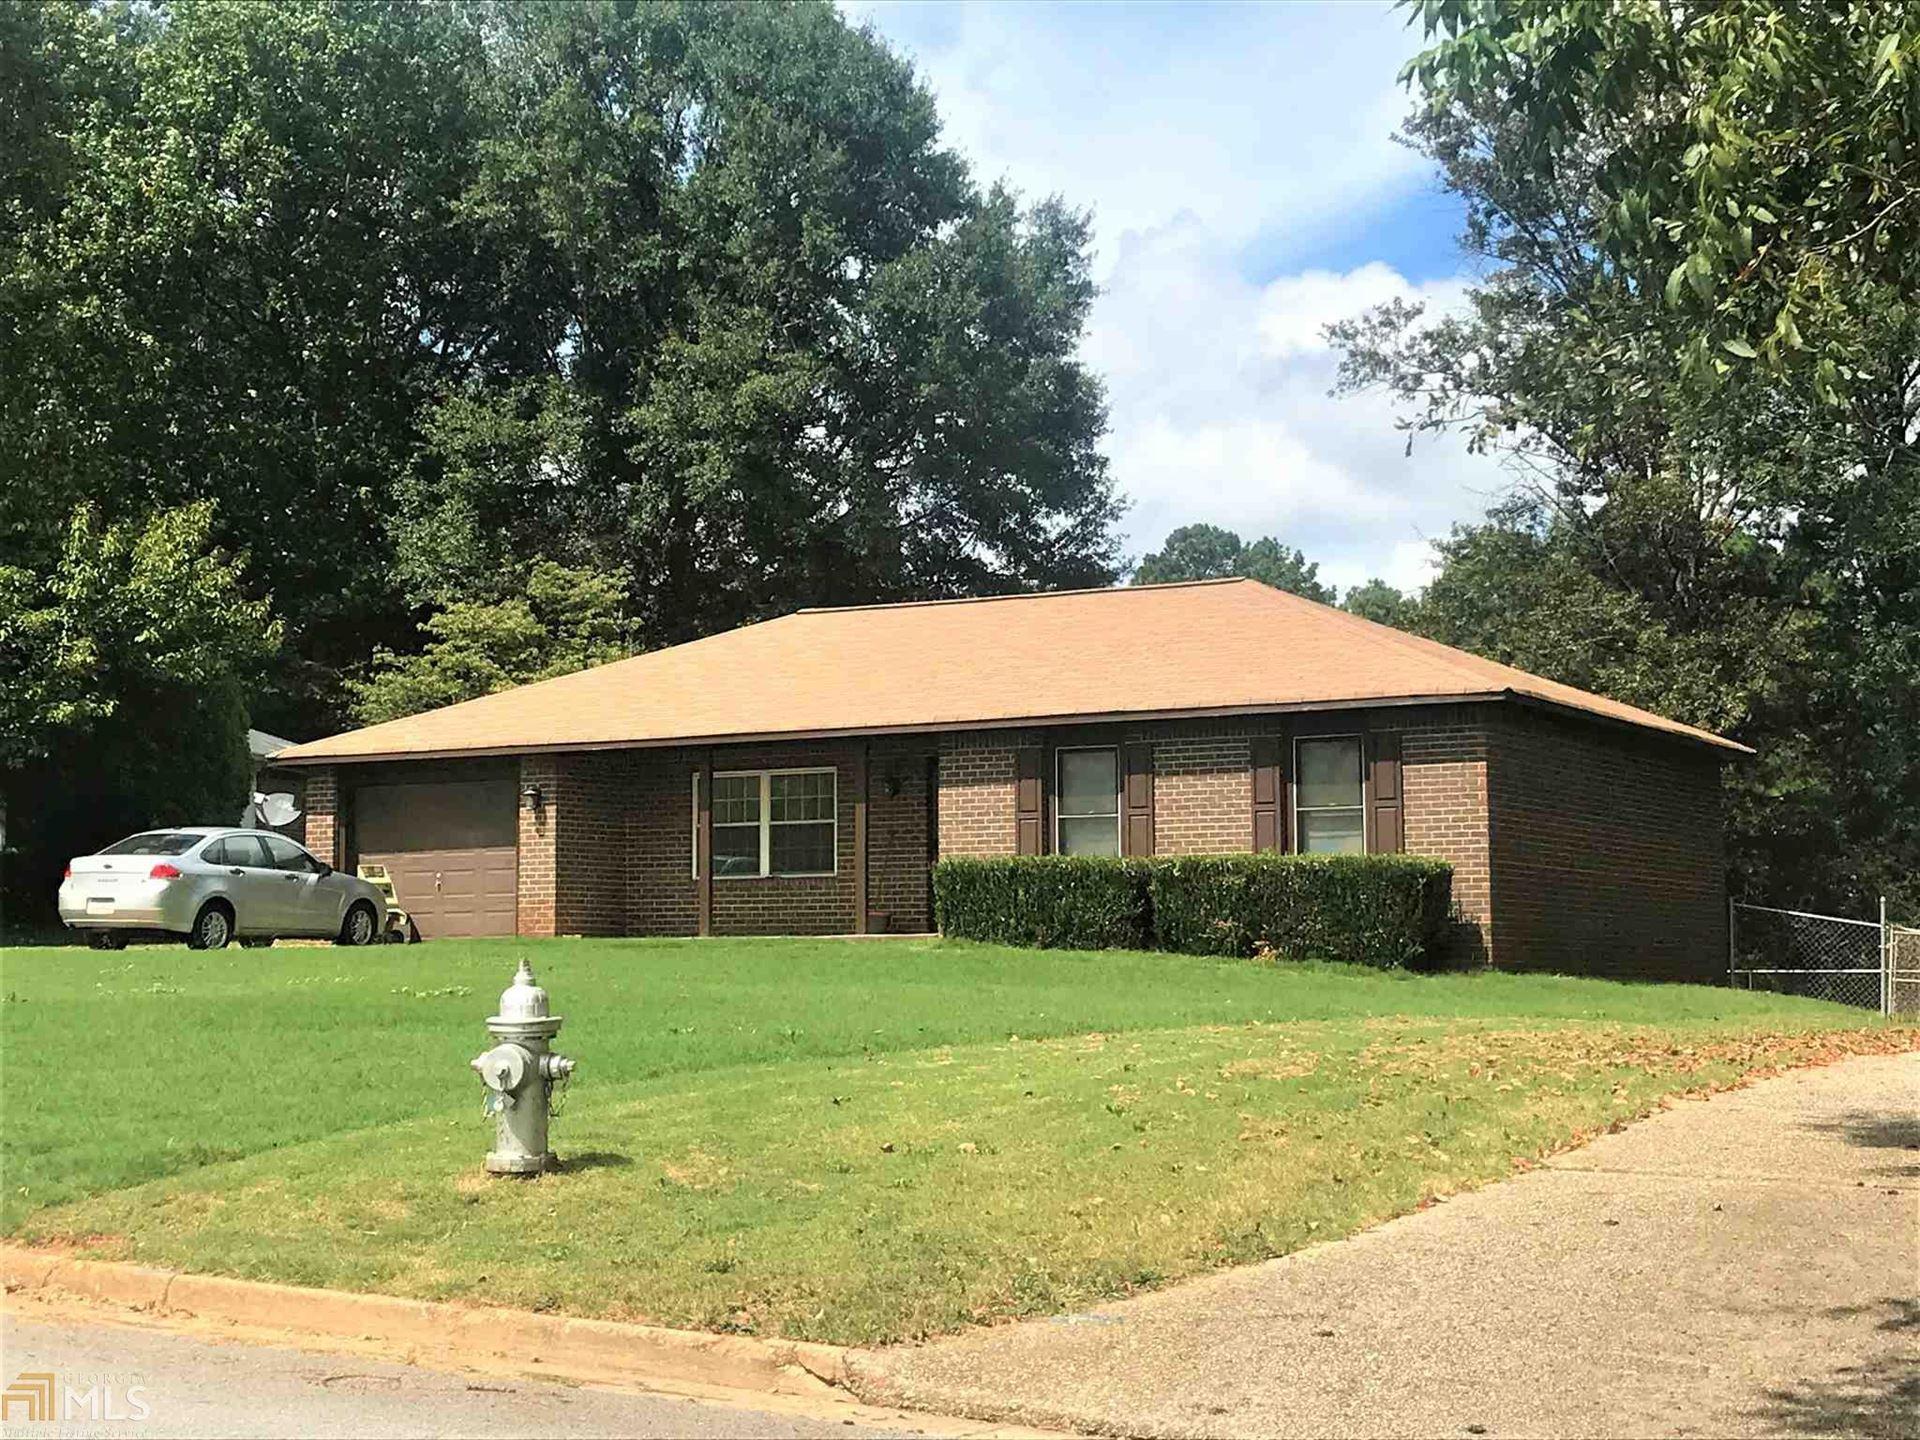 3236 Creekwood Dr, Rex, GA 30273 - #: 8861690